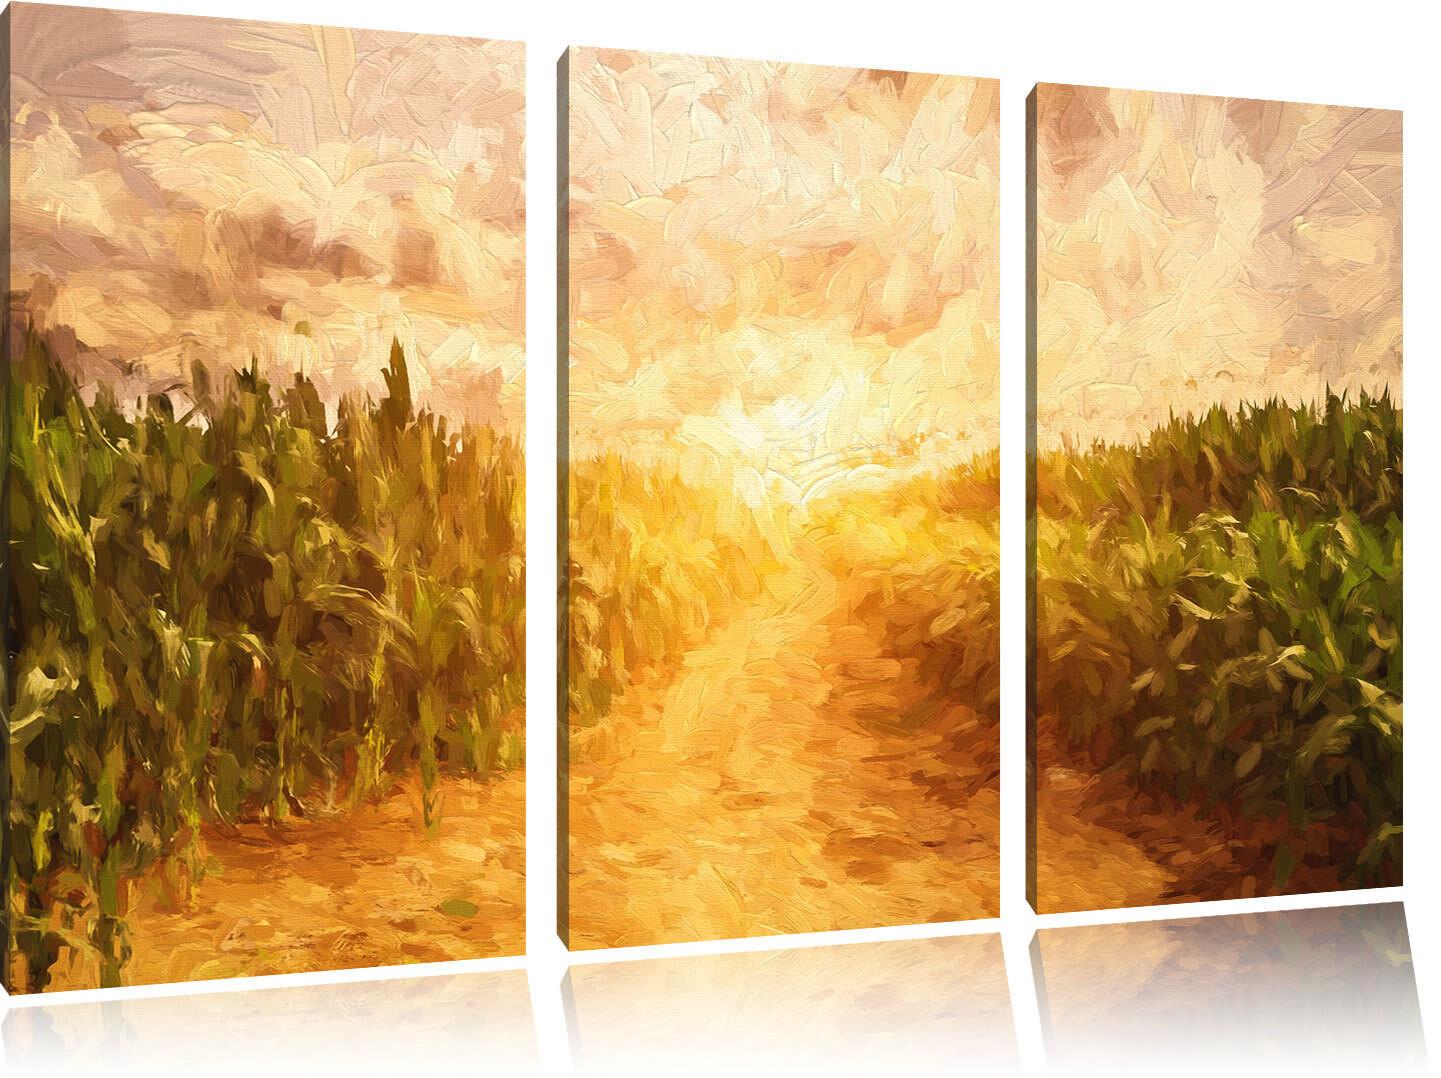 Pfad durch sonniges Feld Kunst Pinsel Effekt 3-Teiler Leinwandbild Wanddeko Kuns